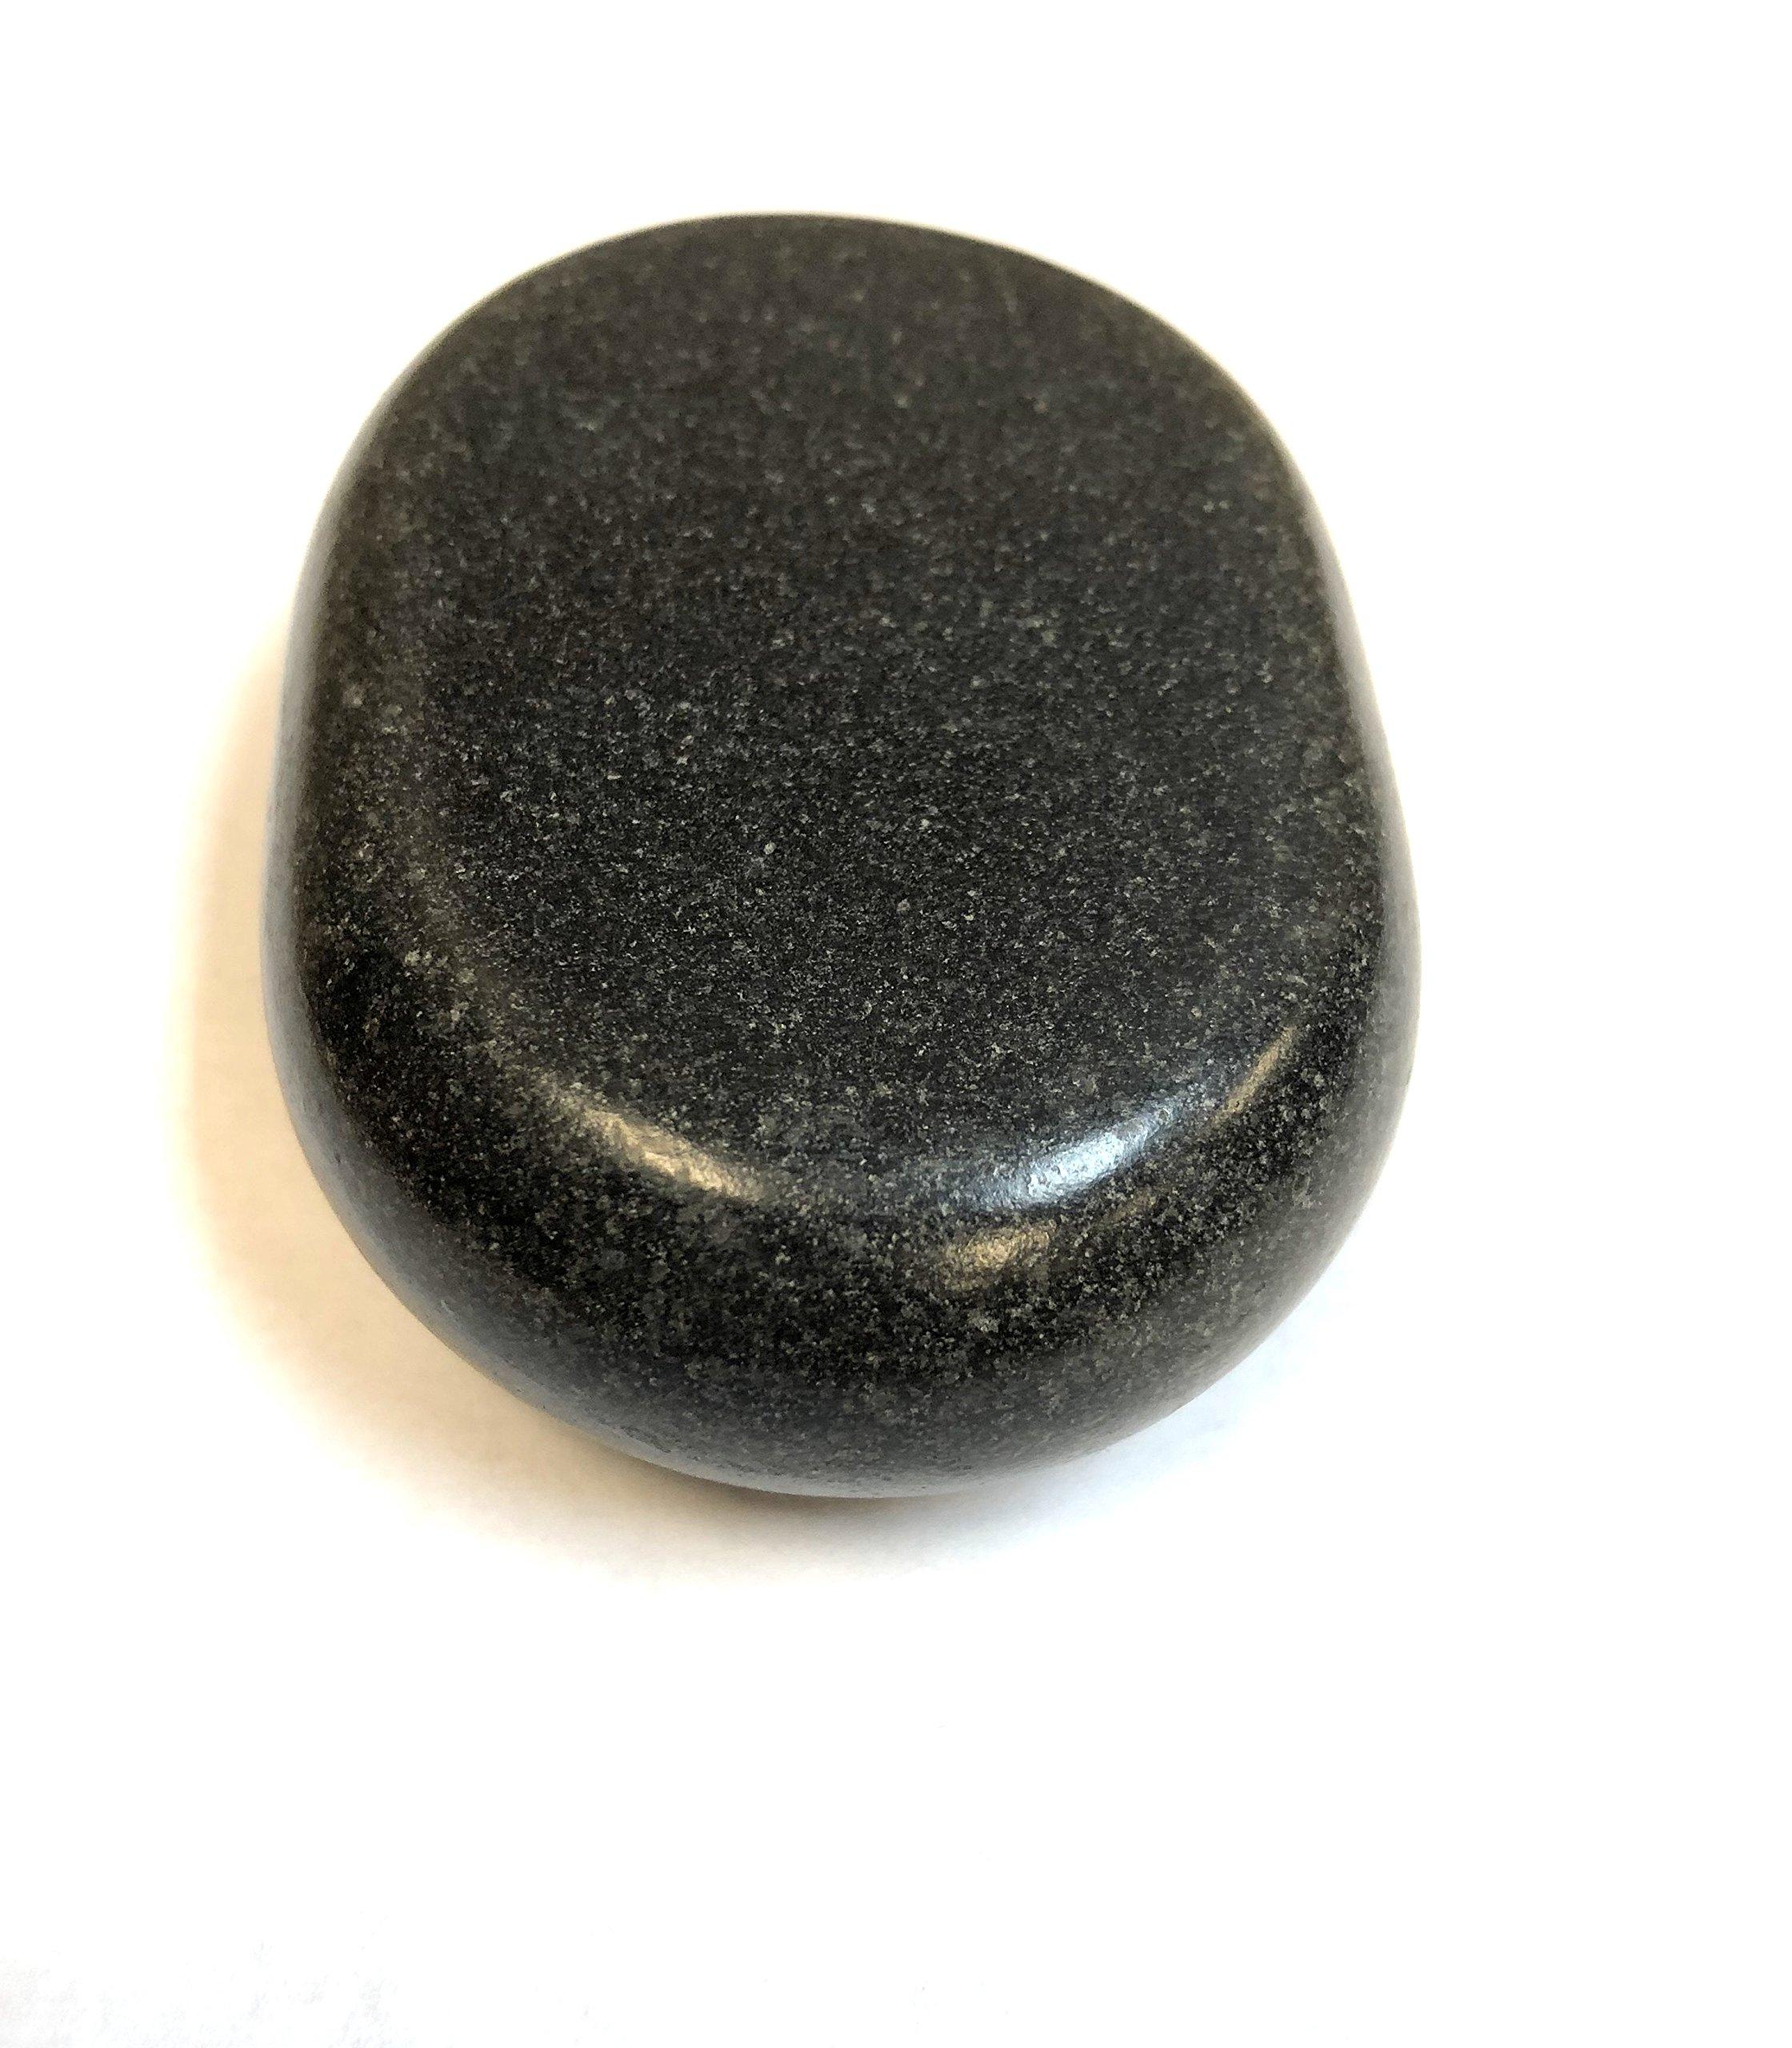 Master Massage 8 Piece Large Ovular Black Basalt Hot Stone Rock Massage Lava Energy Pack